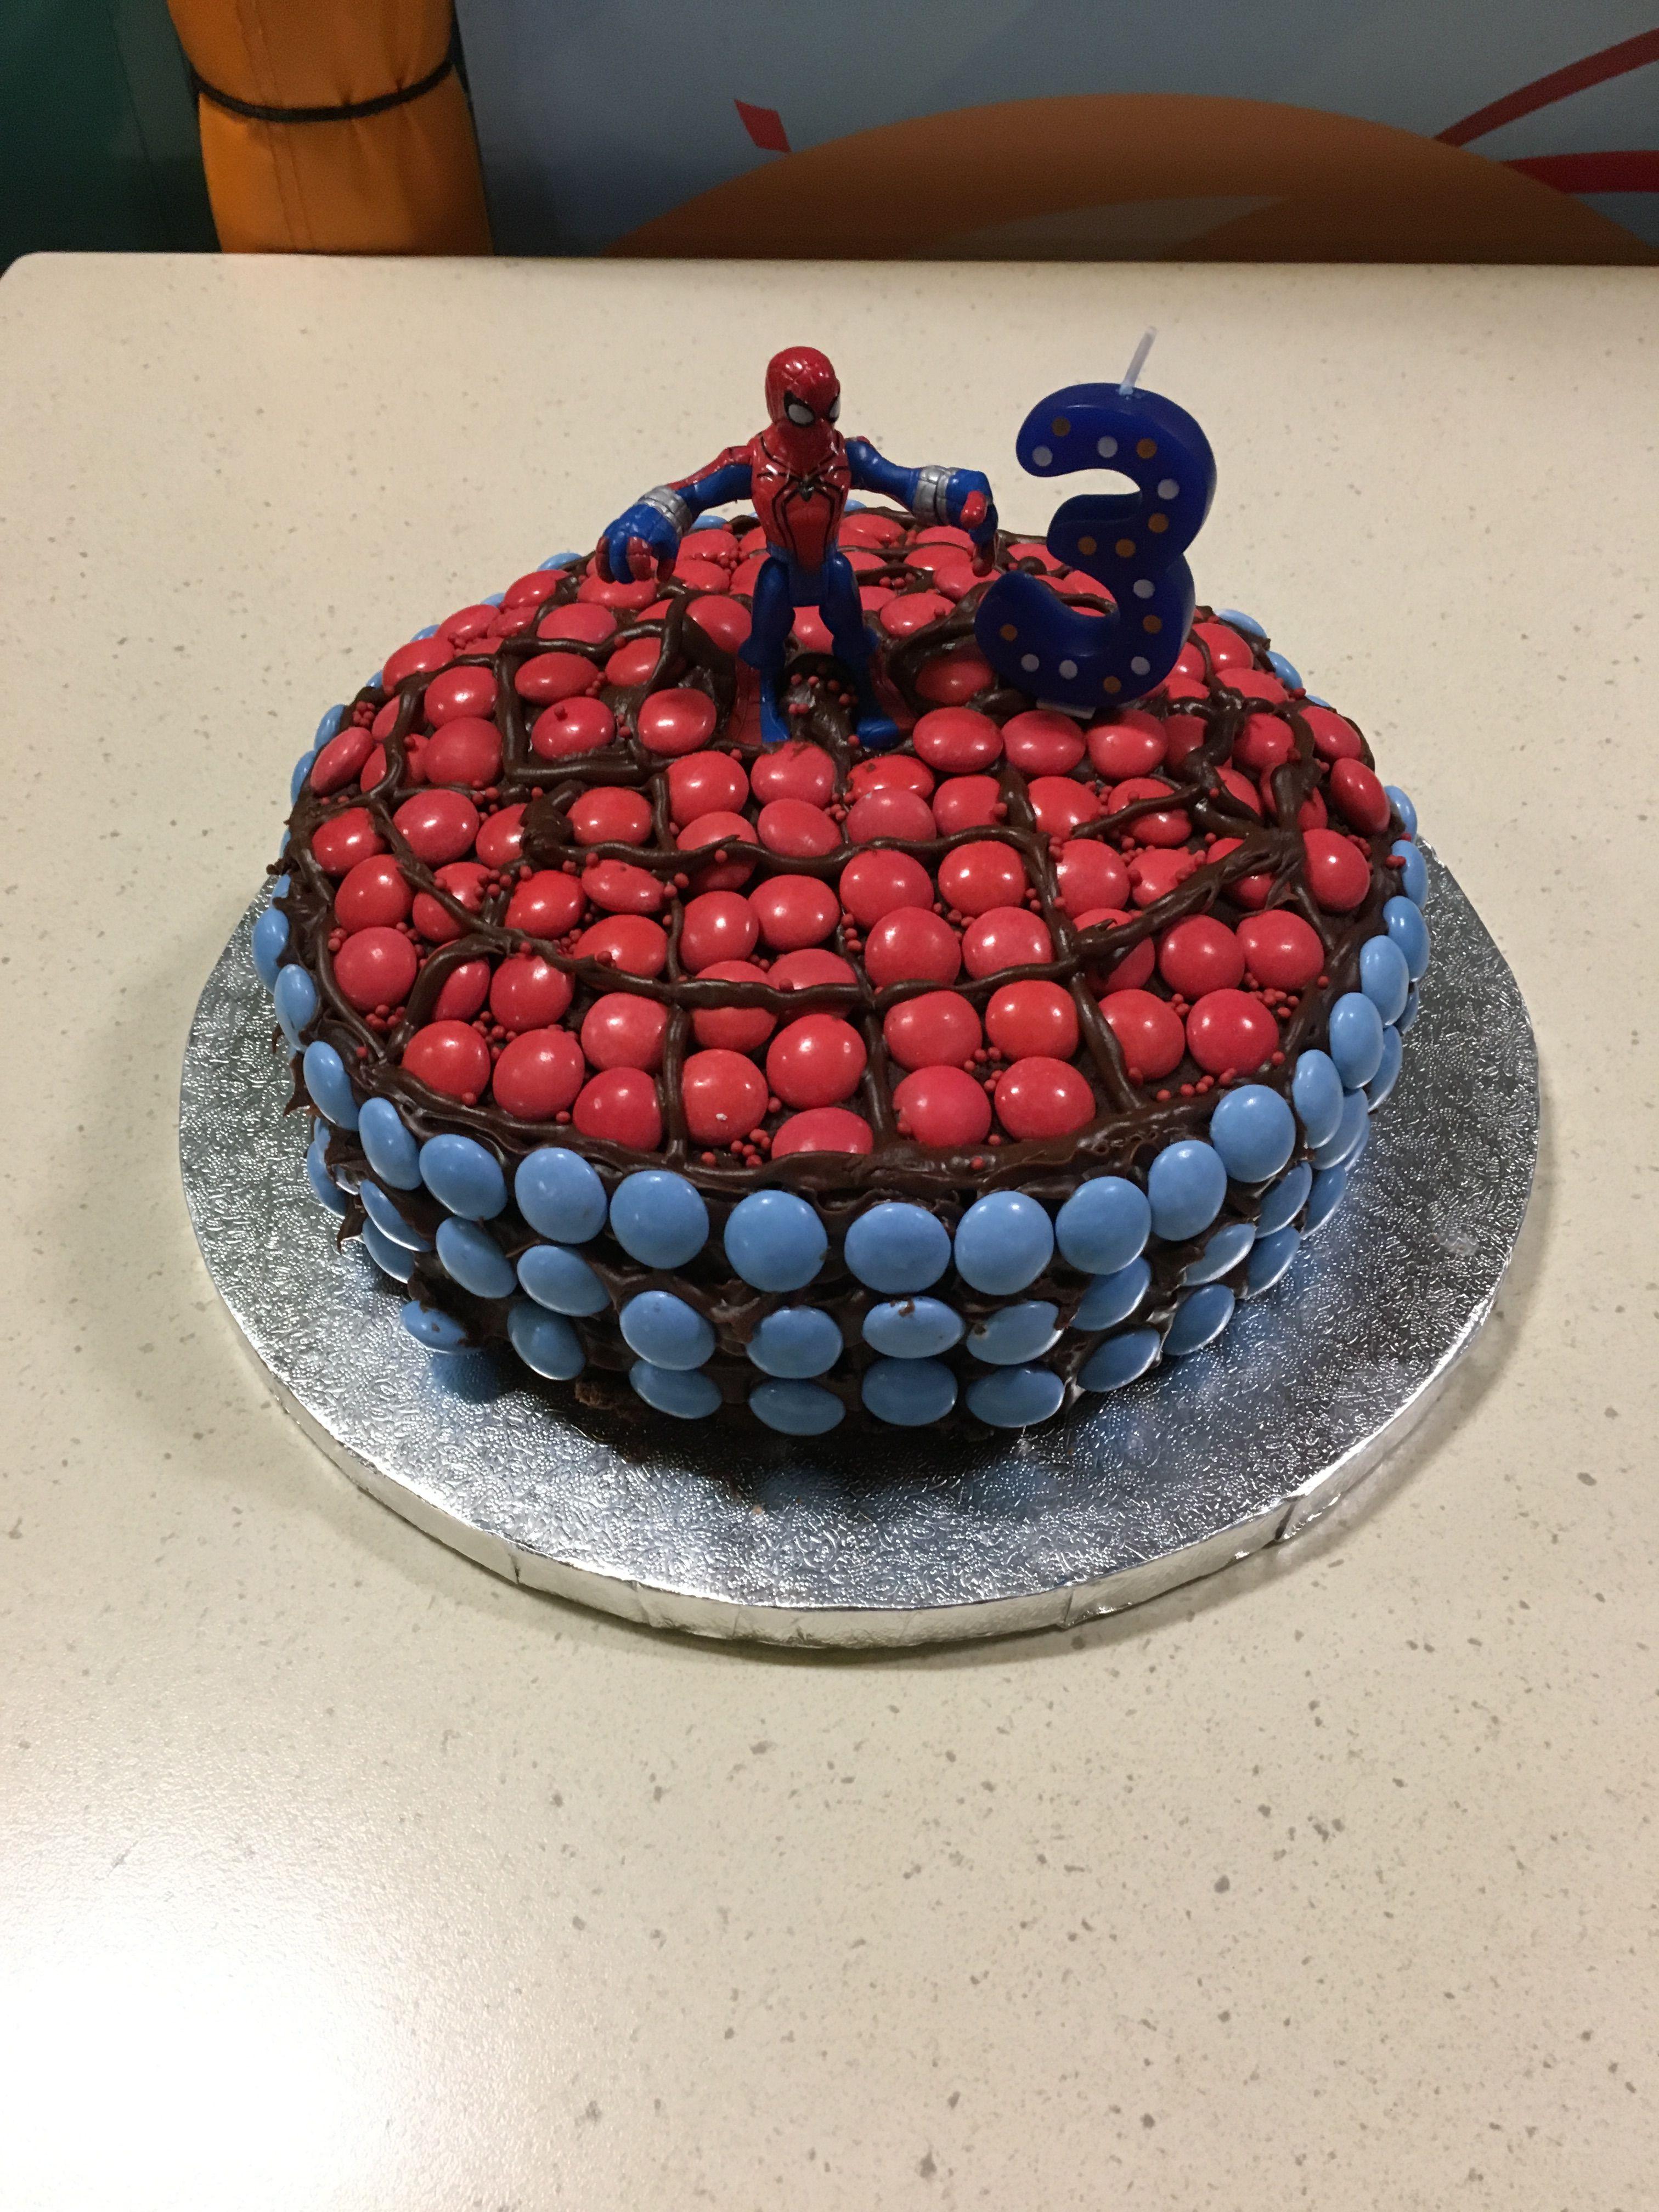 Spider-Man chocolate cake